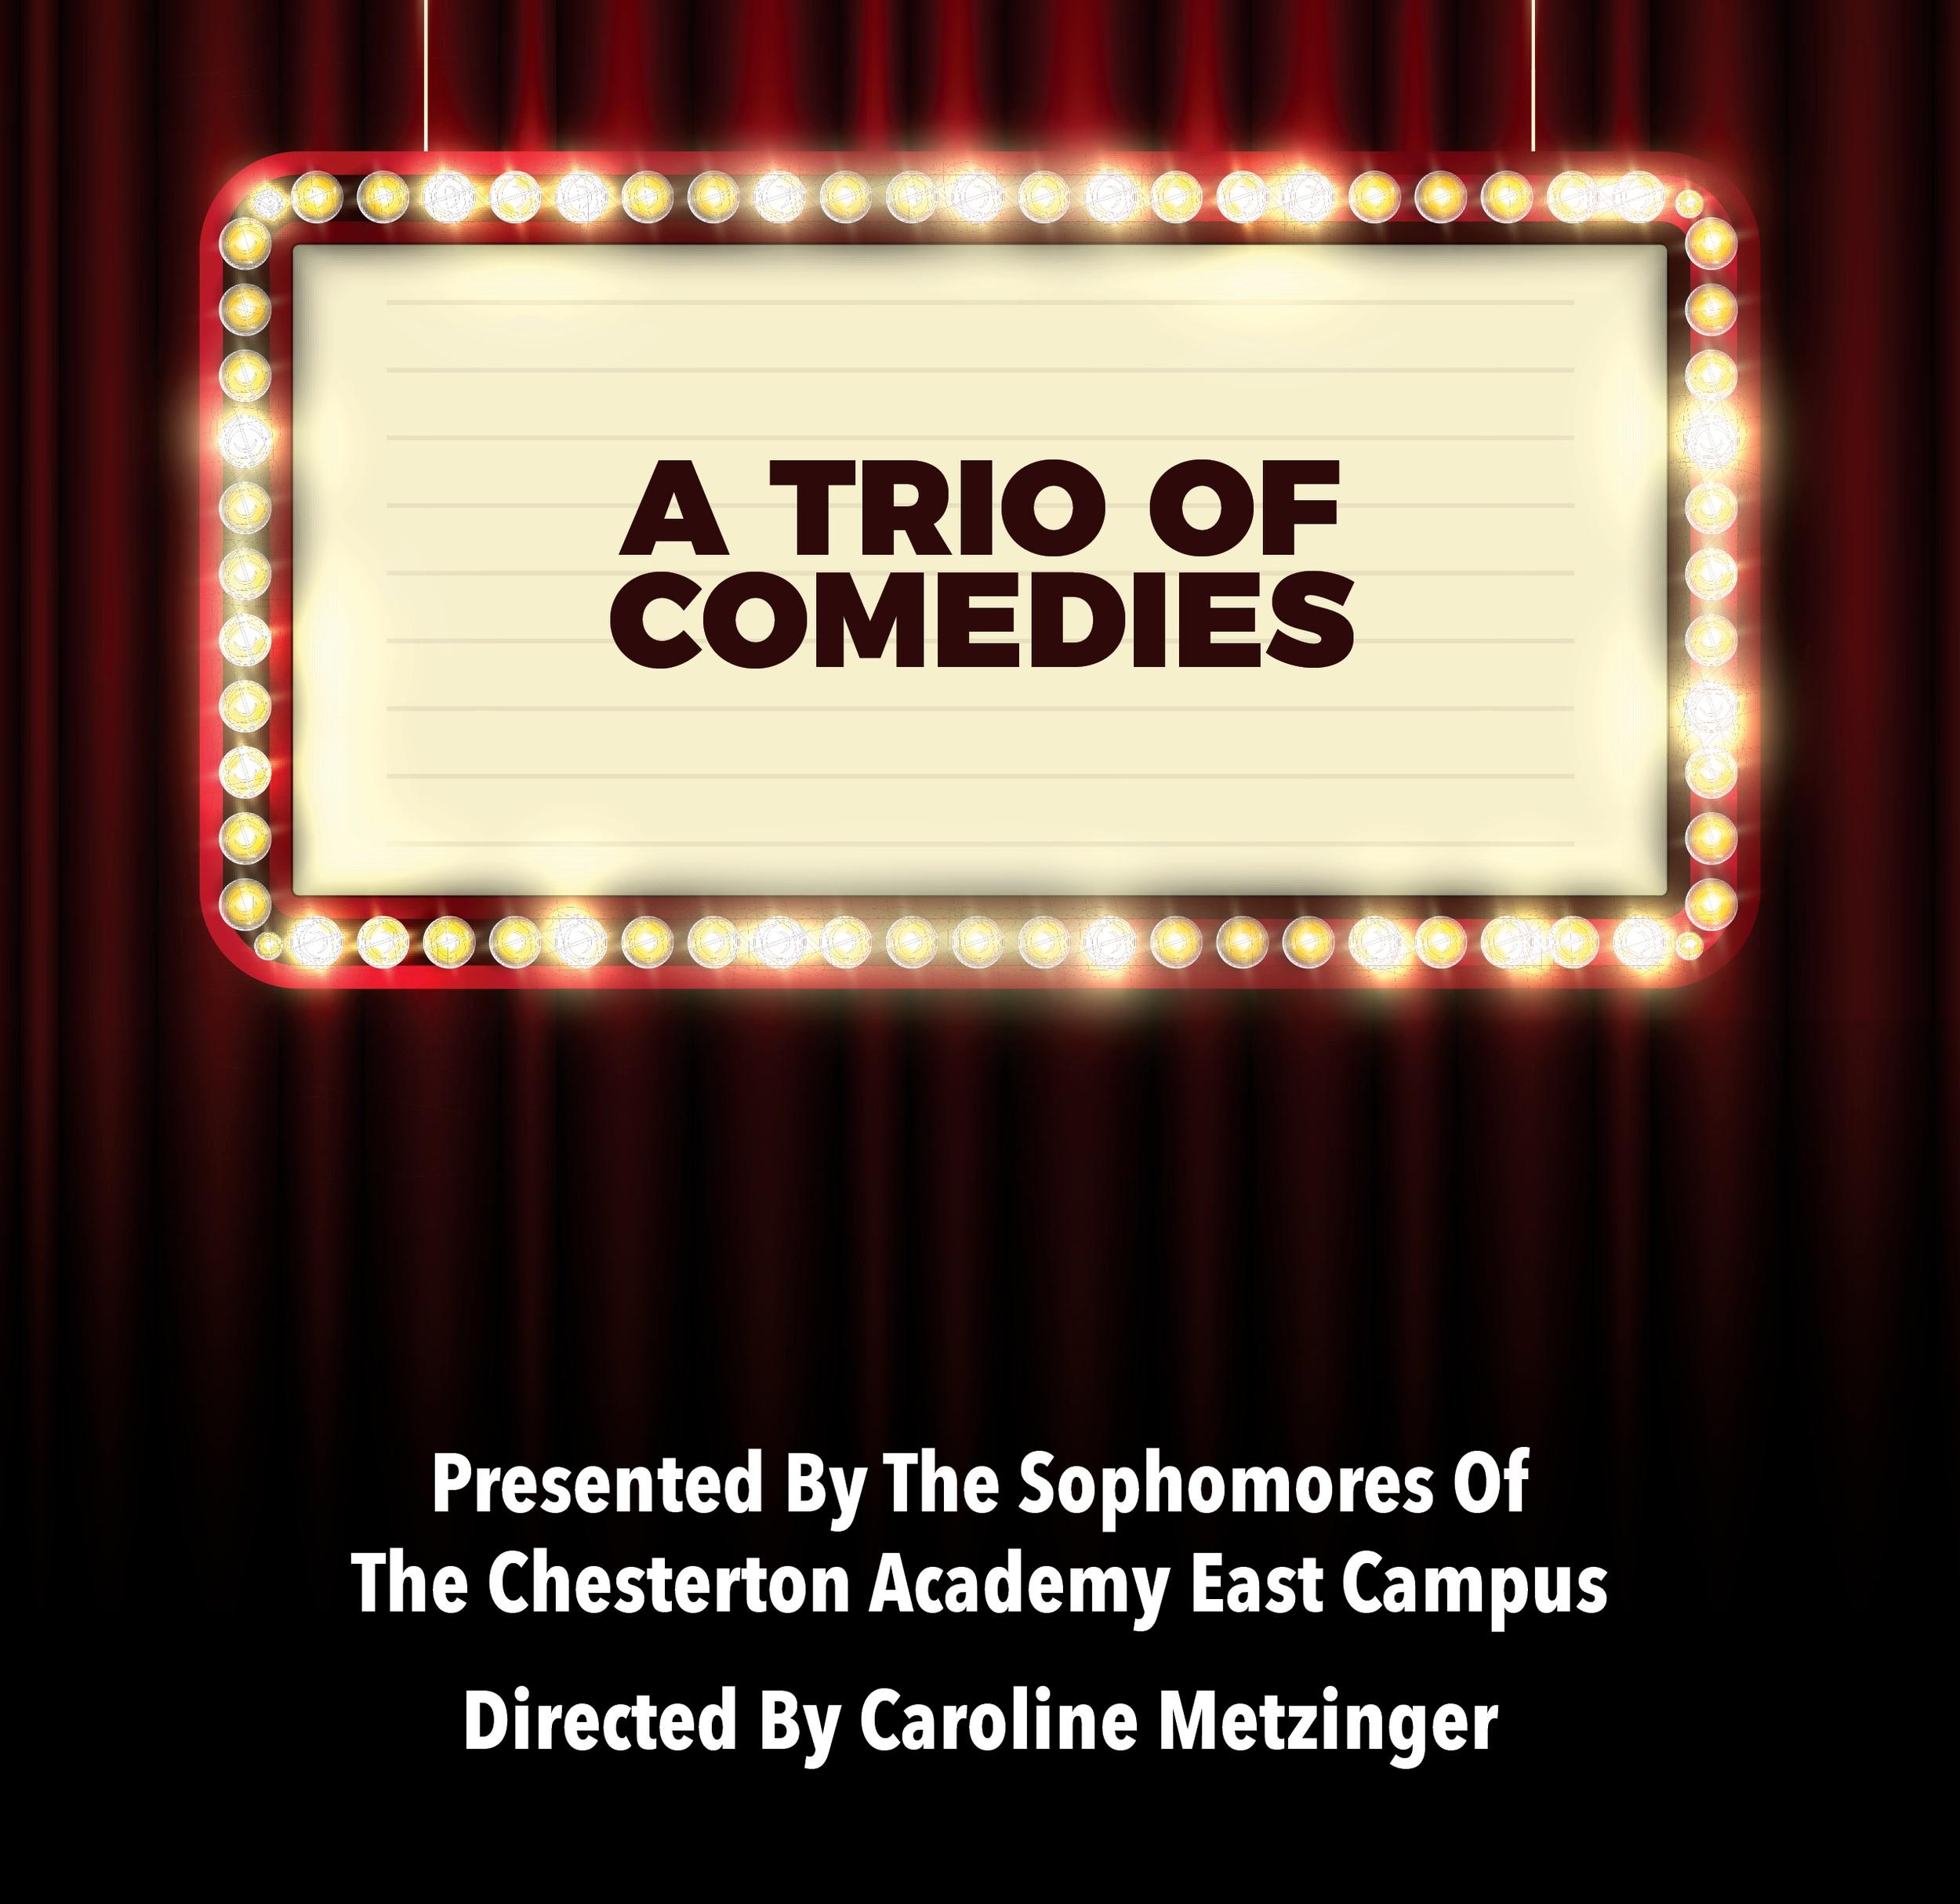 CA_Trio of Comedies 2019